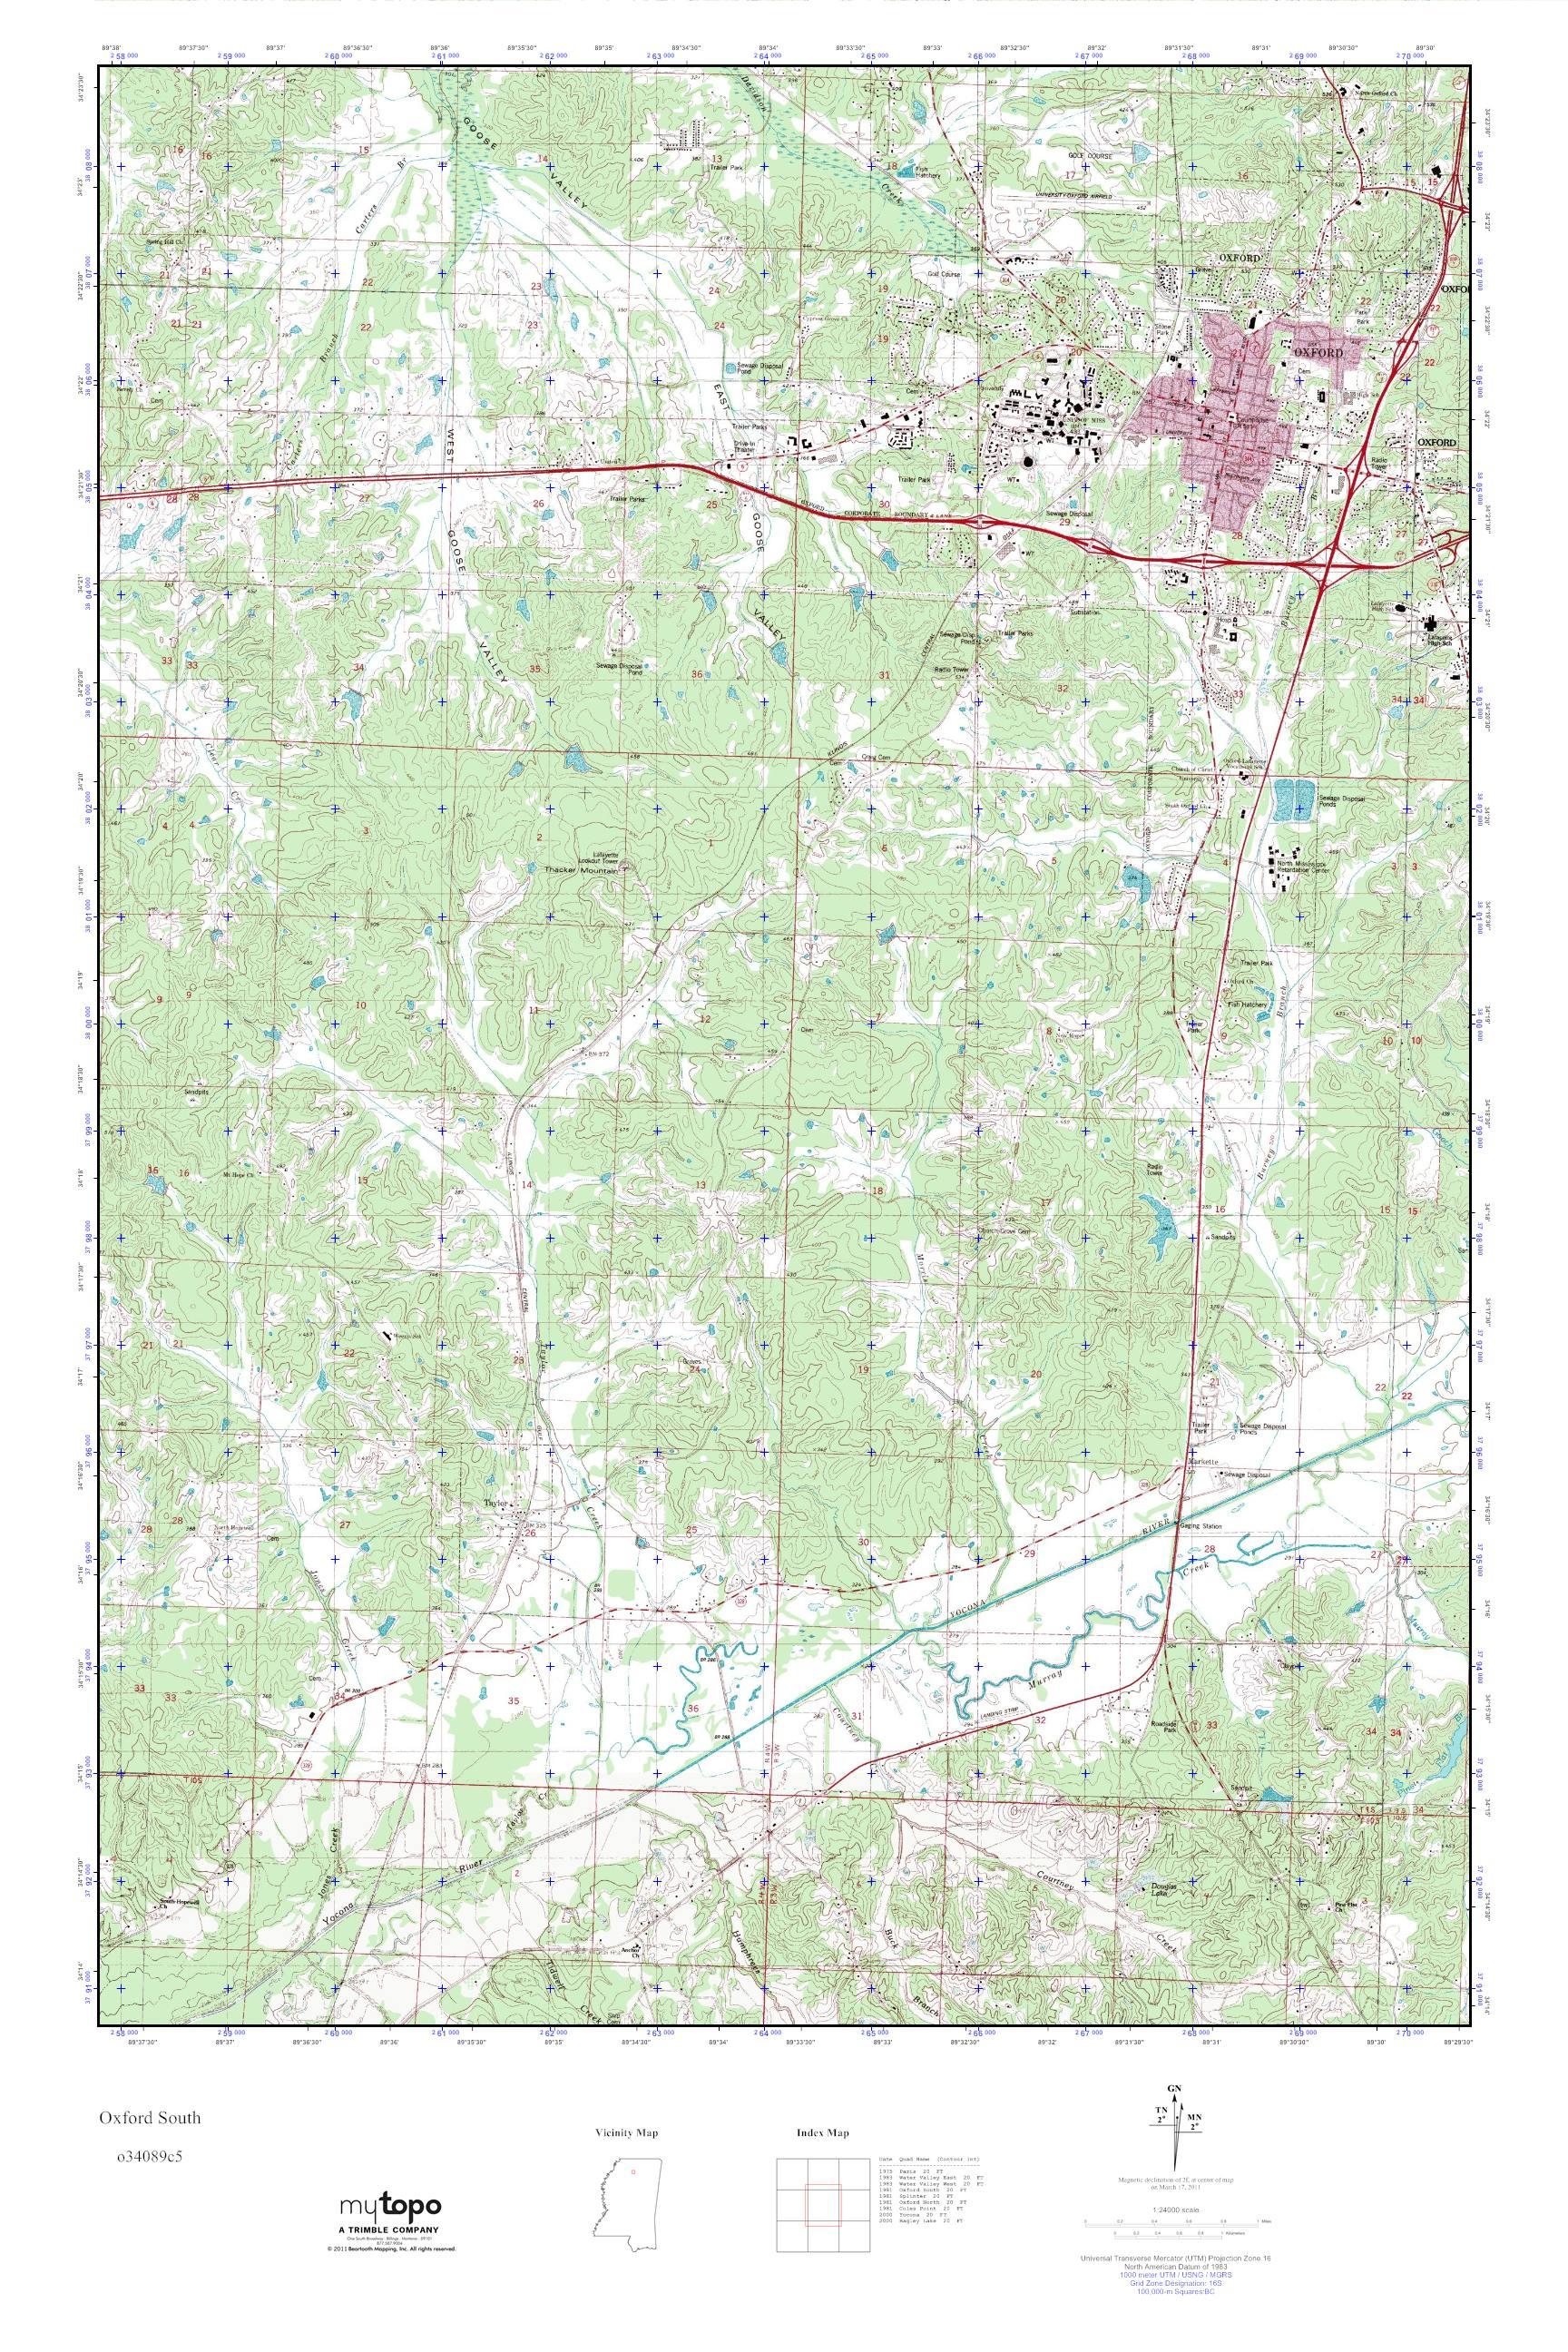 Topographic Map Mississippi.Mytopo Oxford South Mississippi Usgs Quad Topo Map